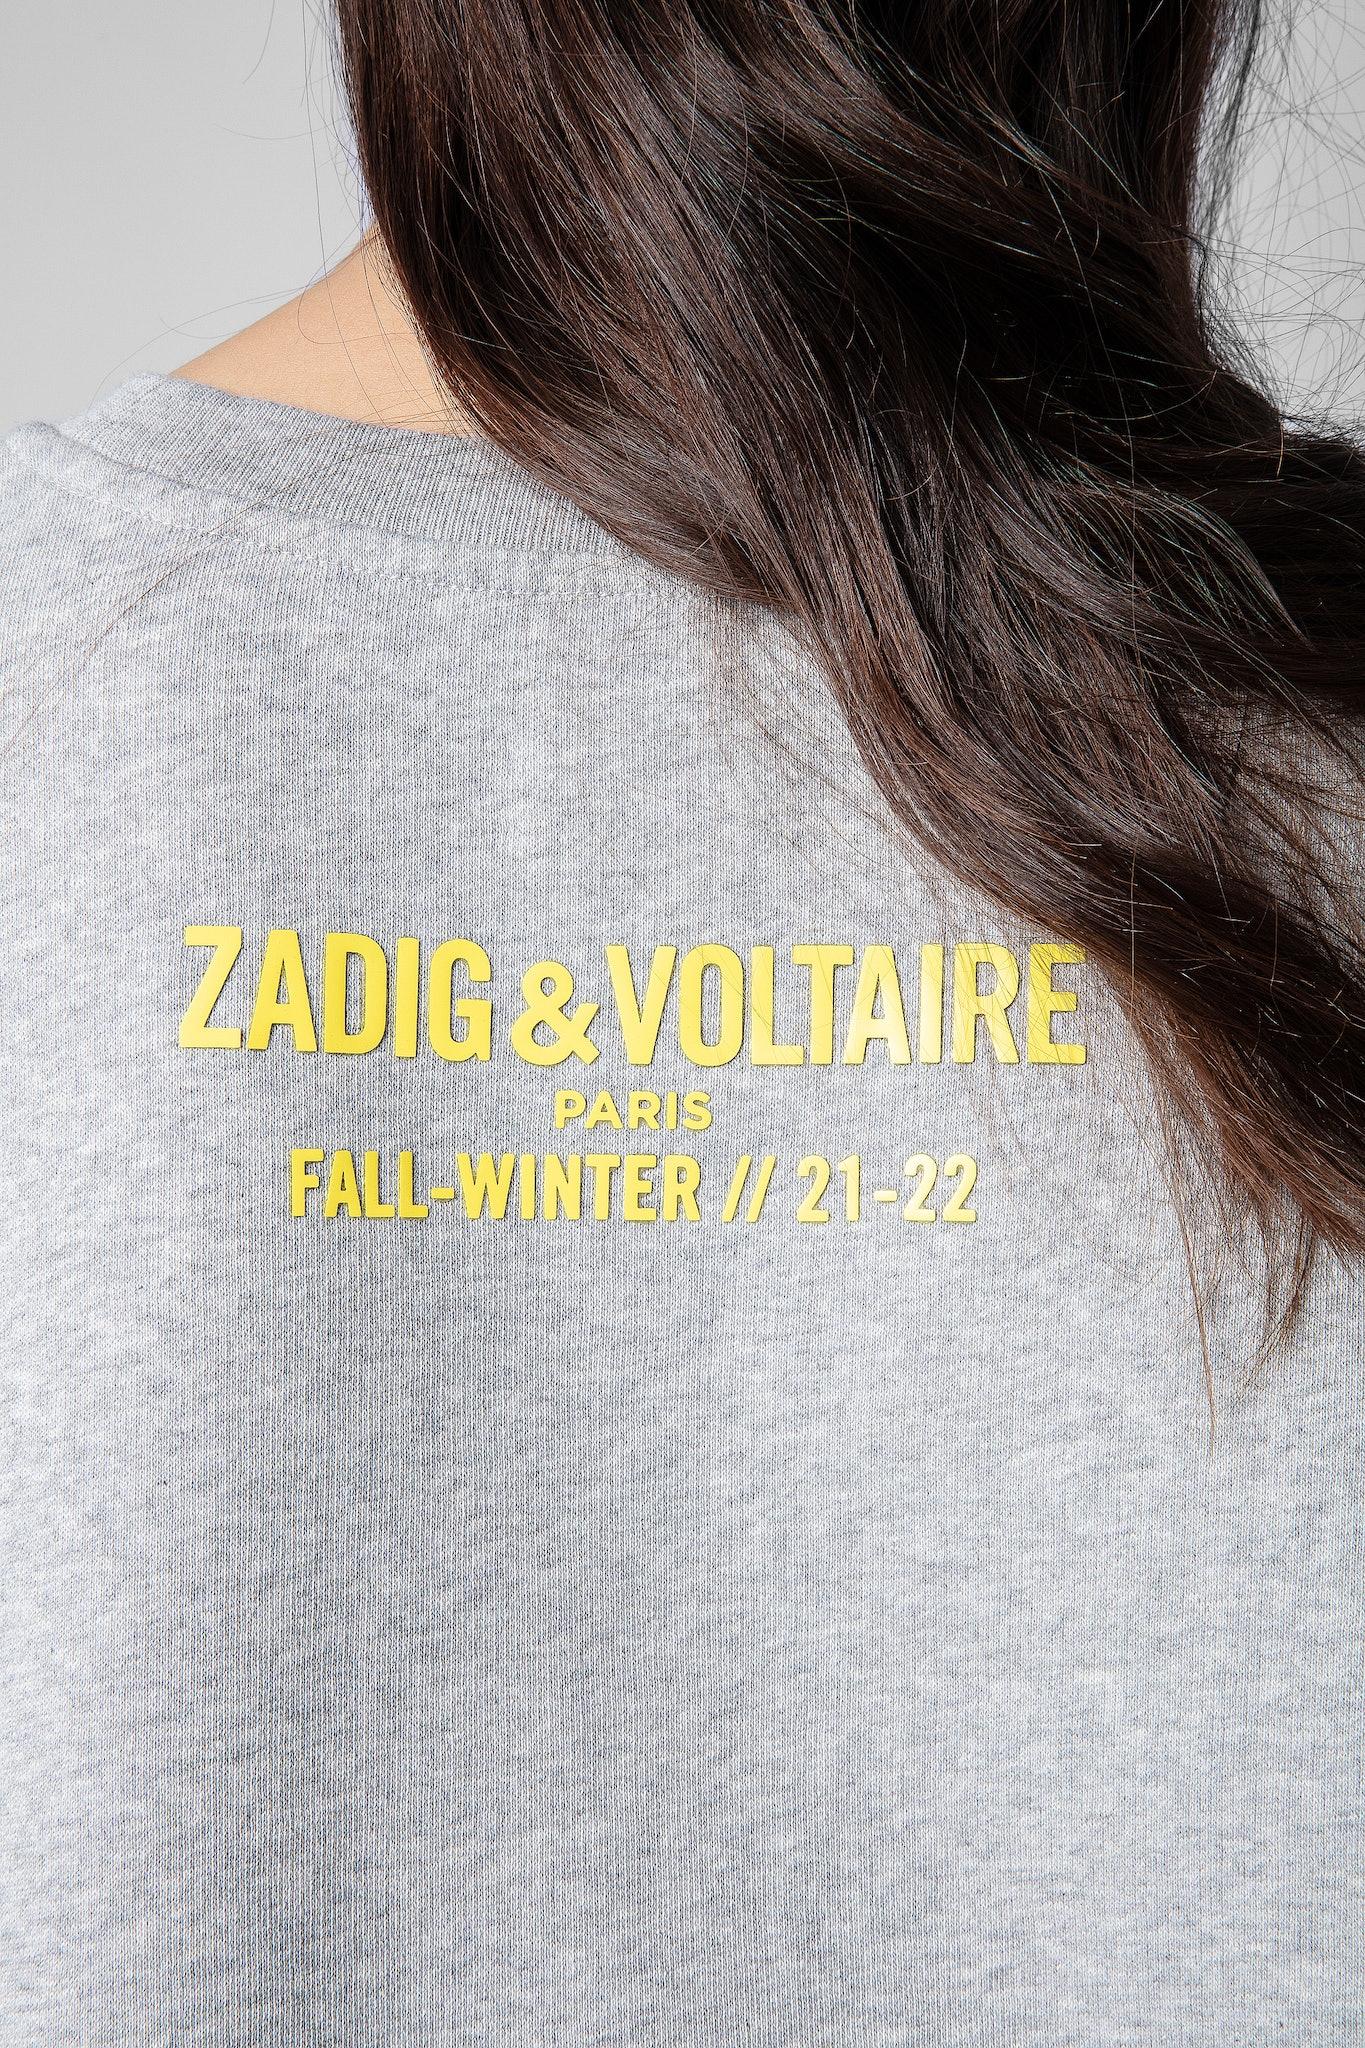 Champ Voltaire Signature Sweatshirt